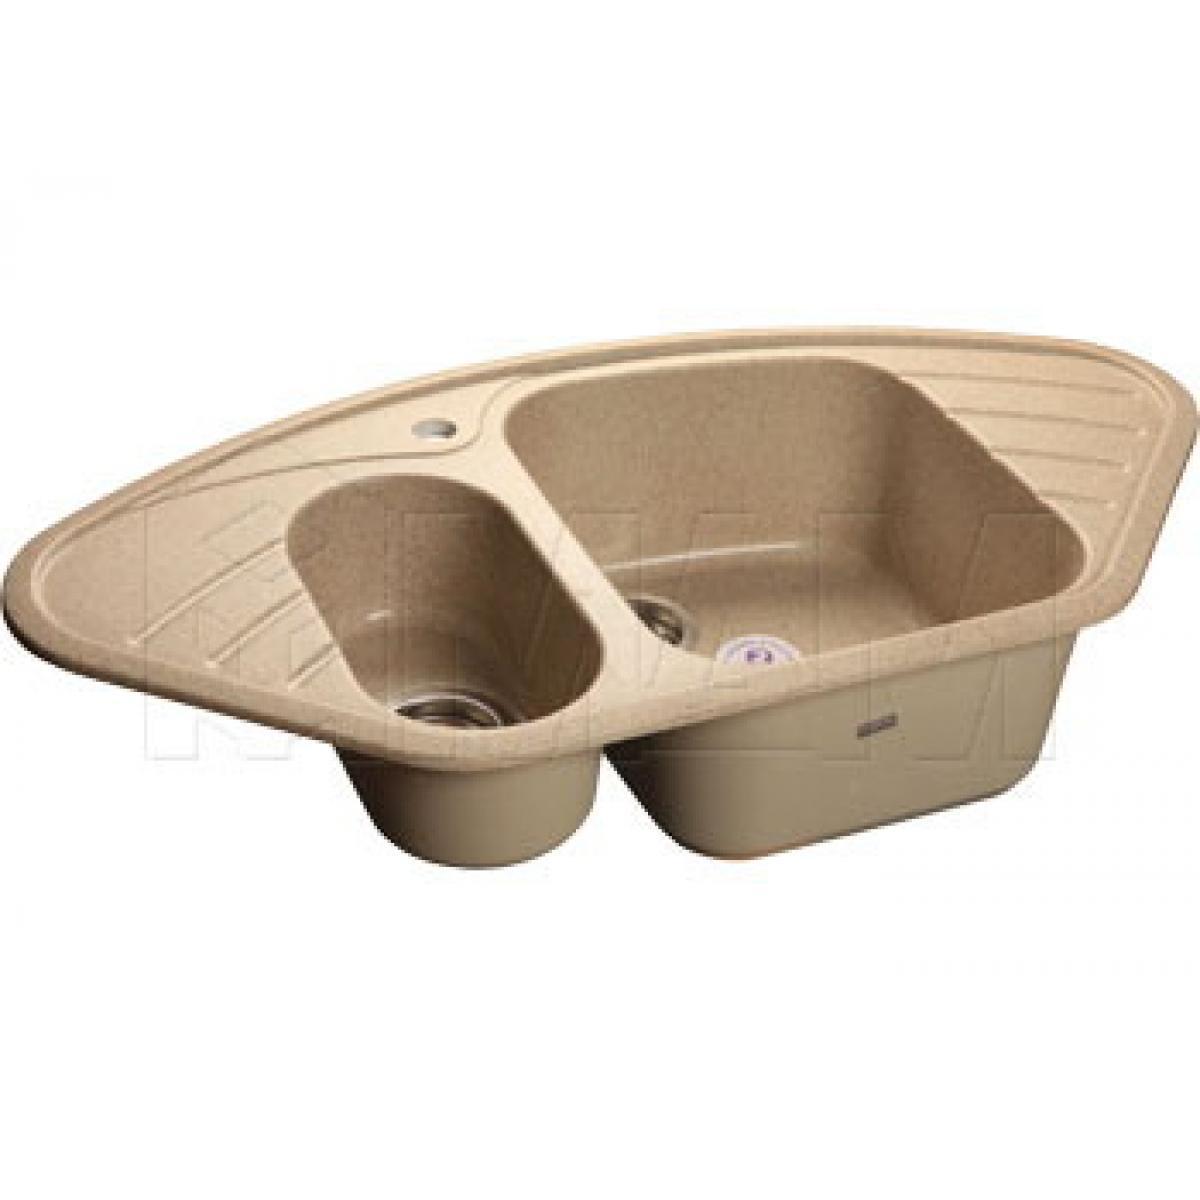 Мойки - CORNER 960E Мойка мрамор угловая, песочный, 960x510, B900x900